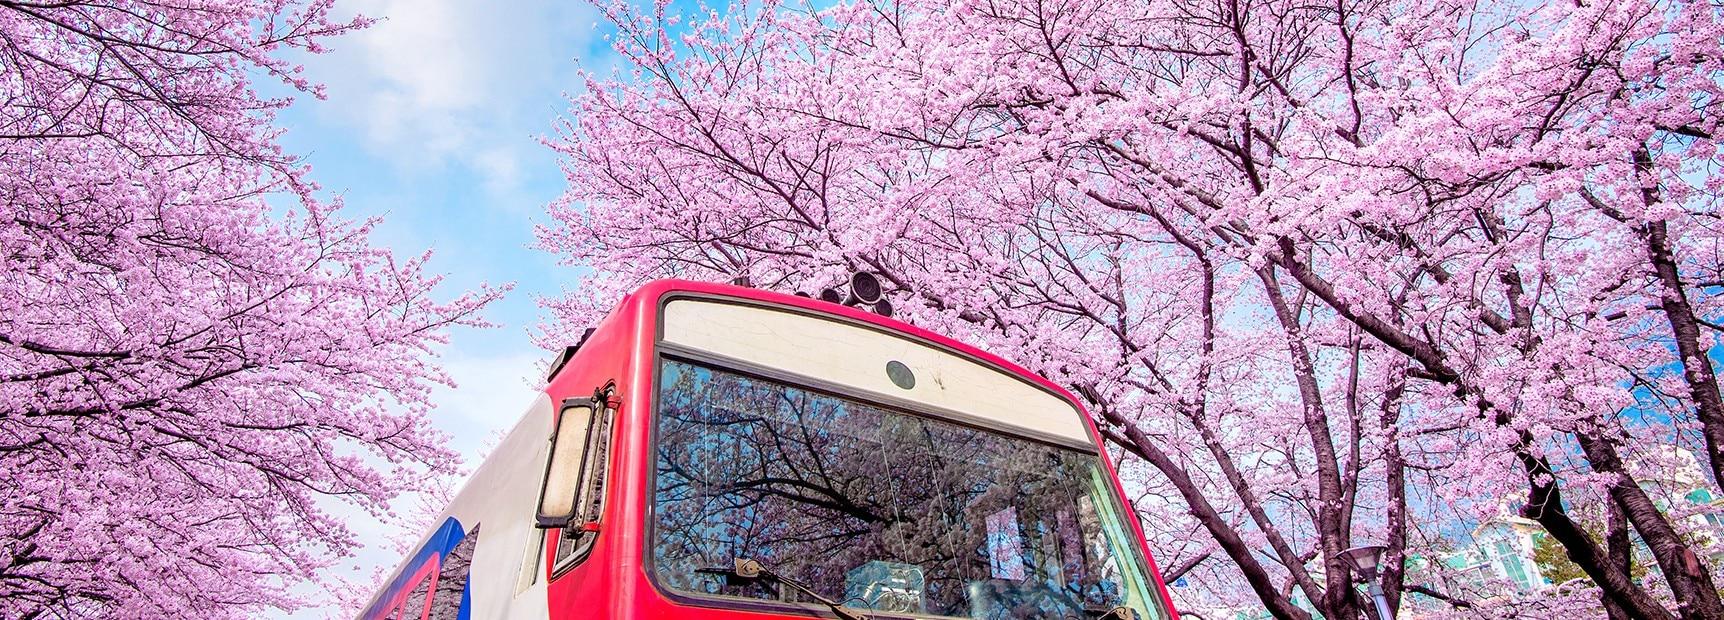 Korea S Beautiful Blossom Season Bbc Earth